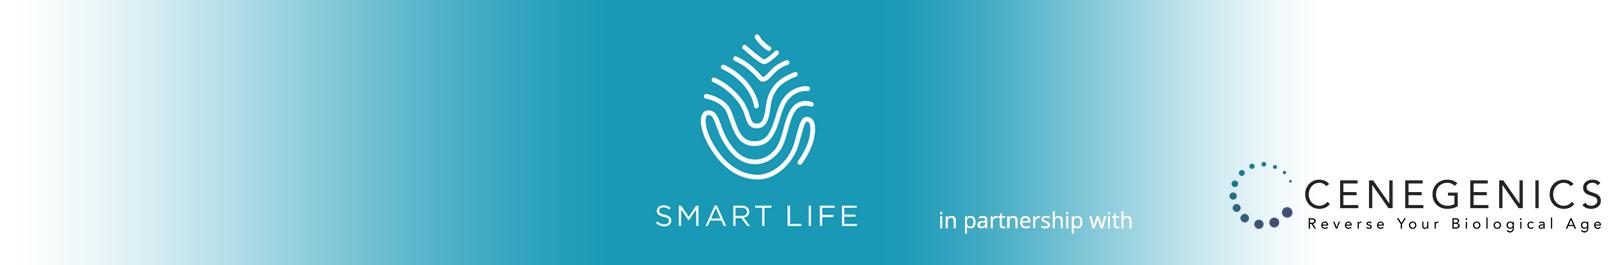 smart-life-uk-cenegenics-banner-4